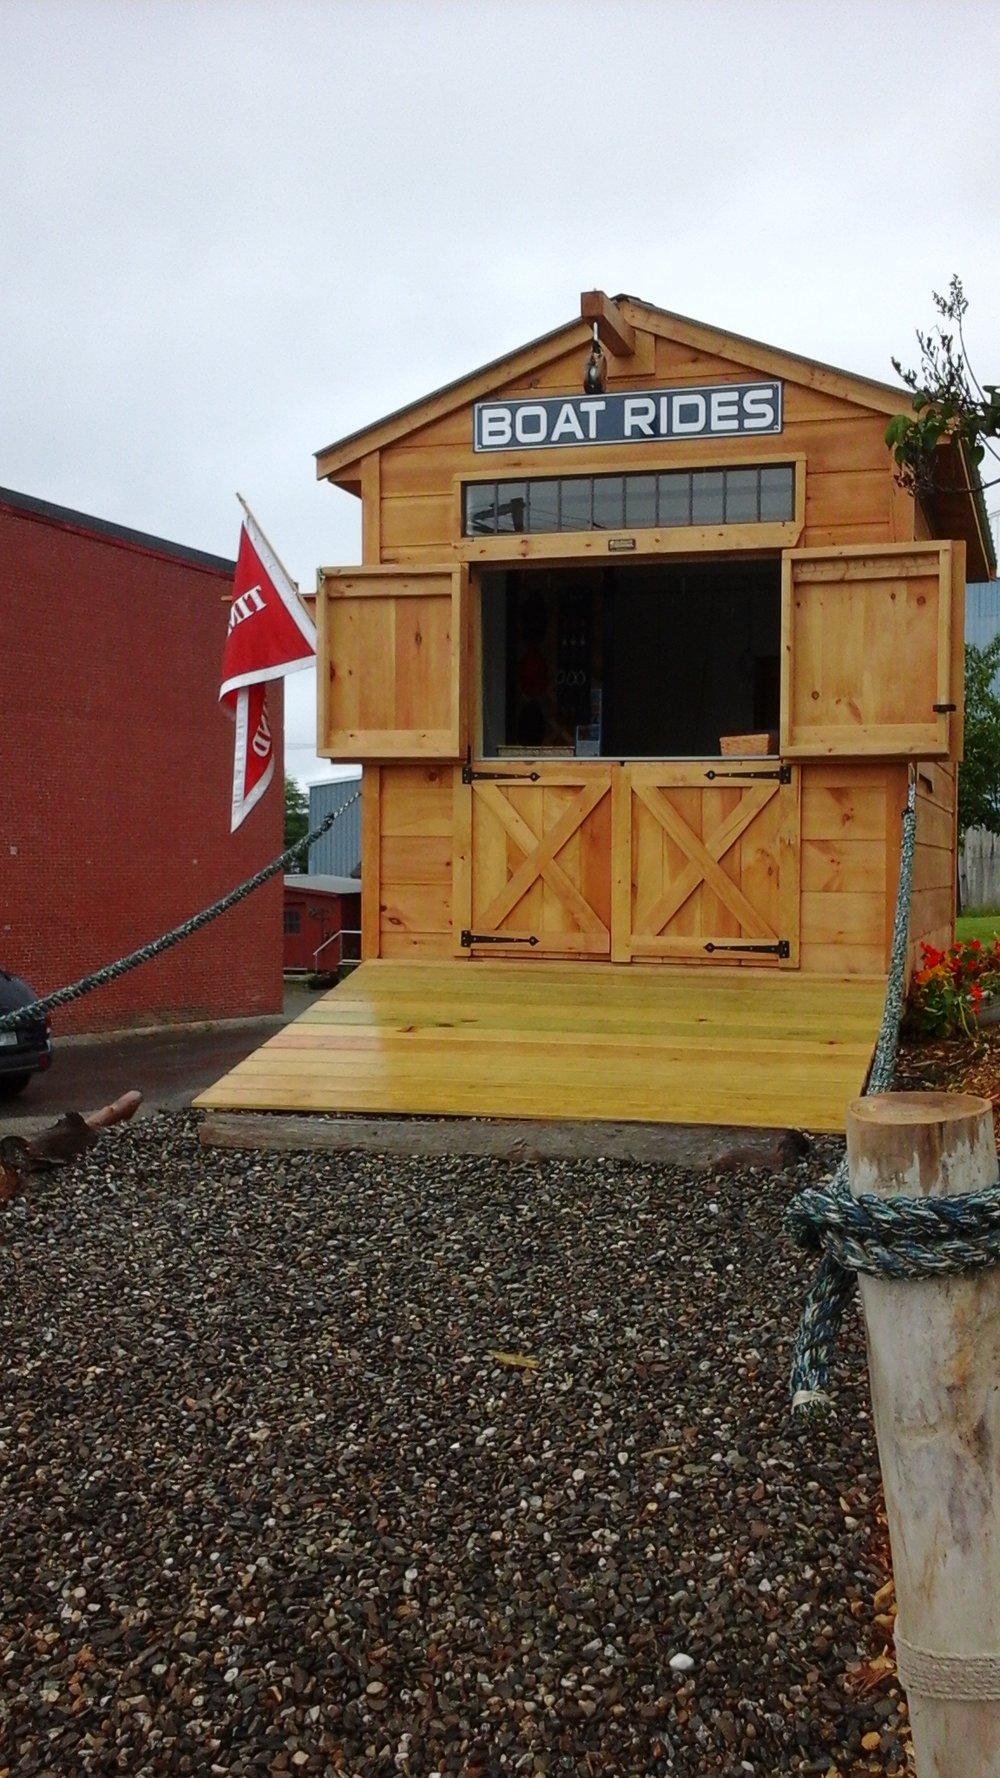 Maine Day sail ticketing kiosk & ship store =28 Main St. Belfast, maine, usa